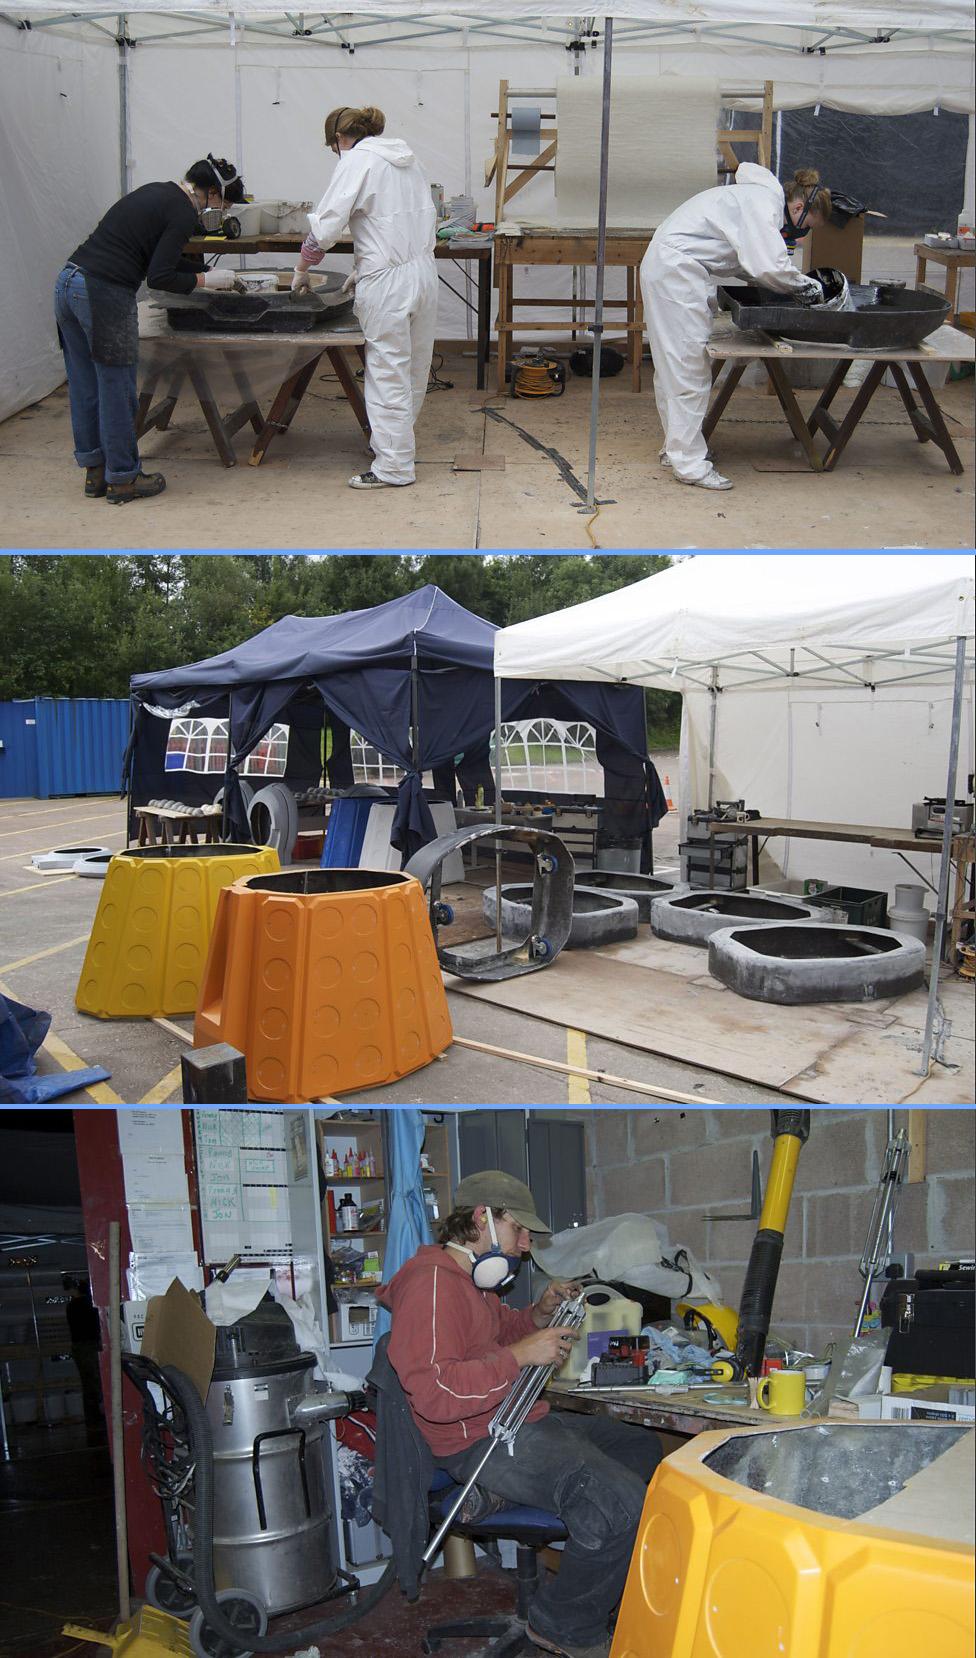 The Daleks under construction